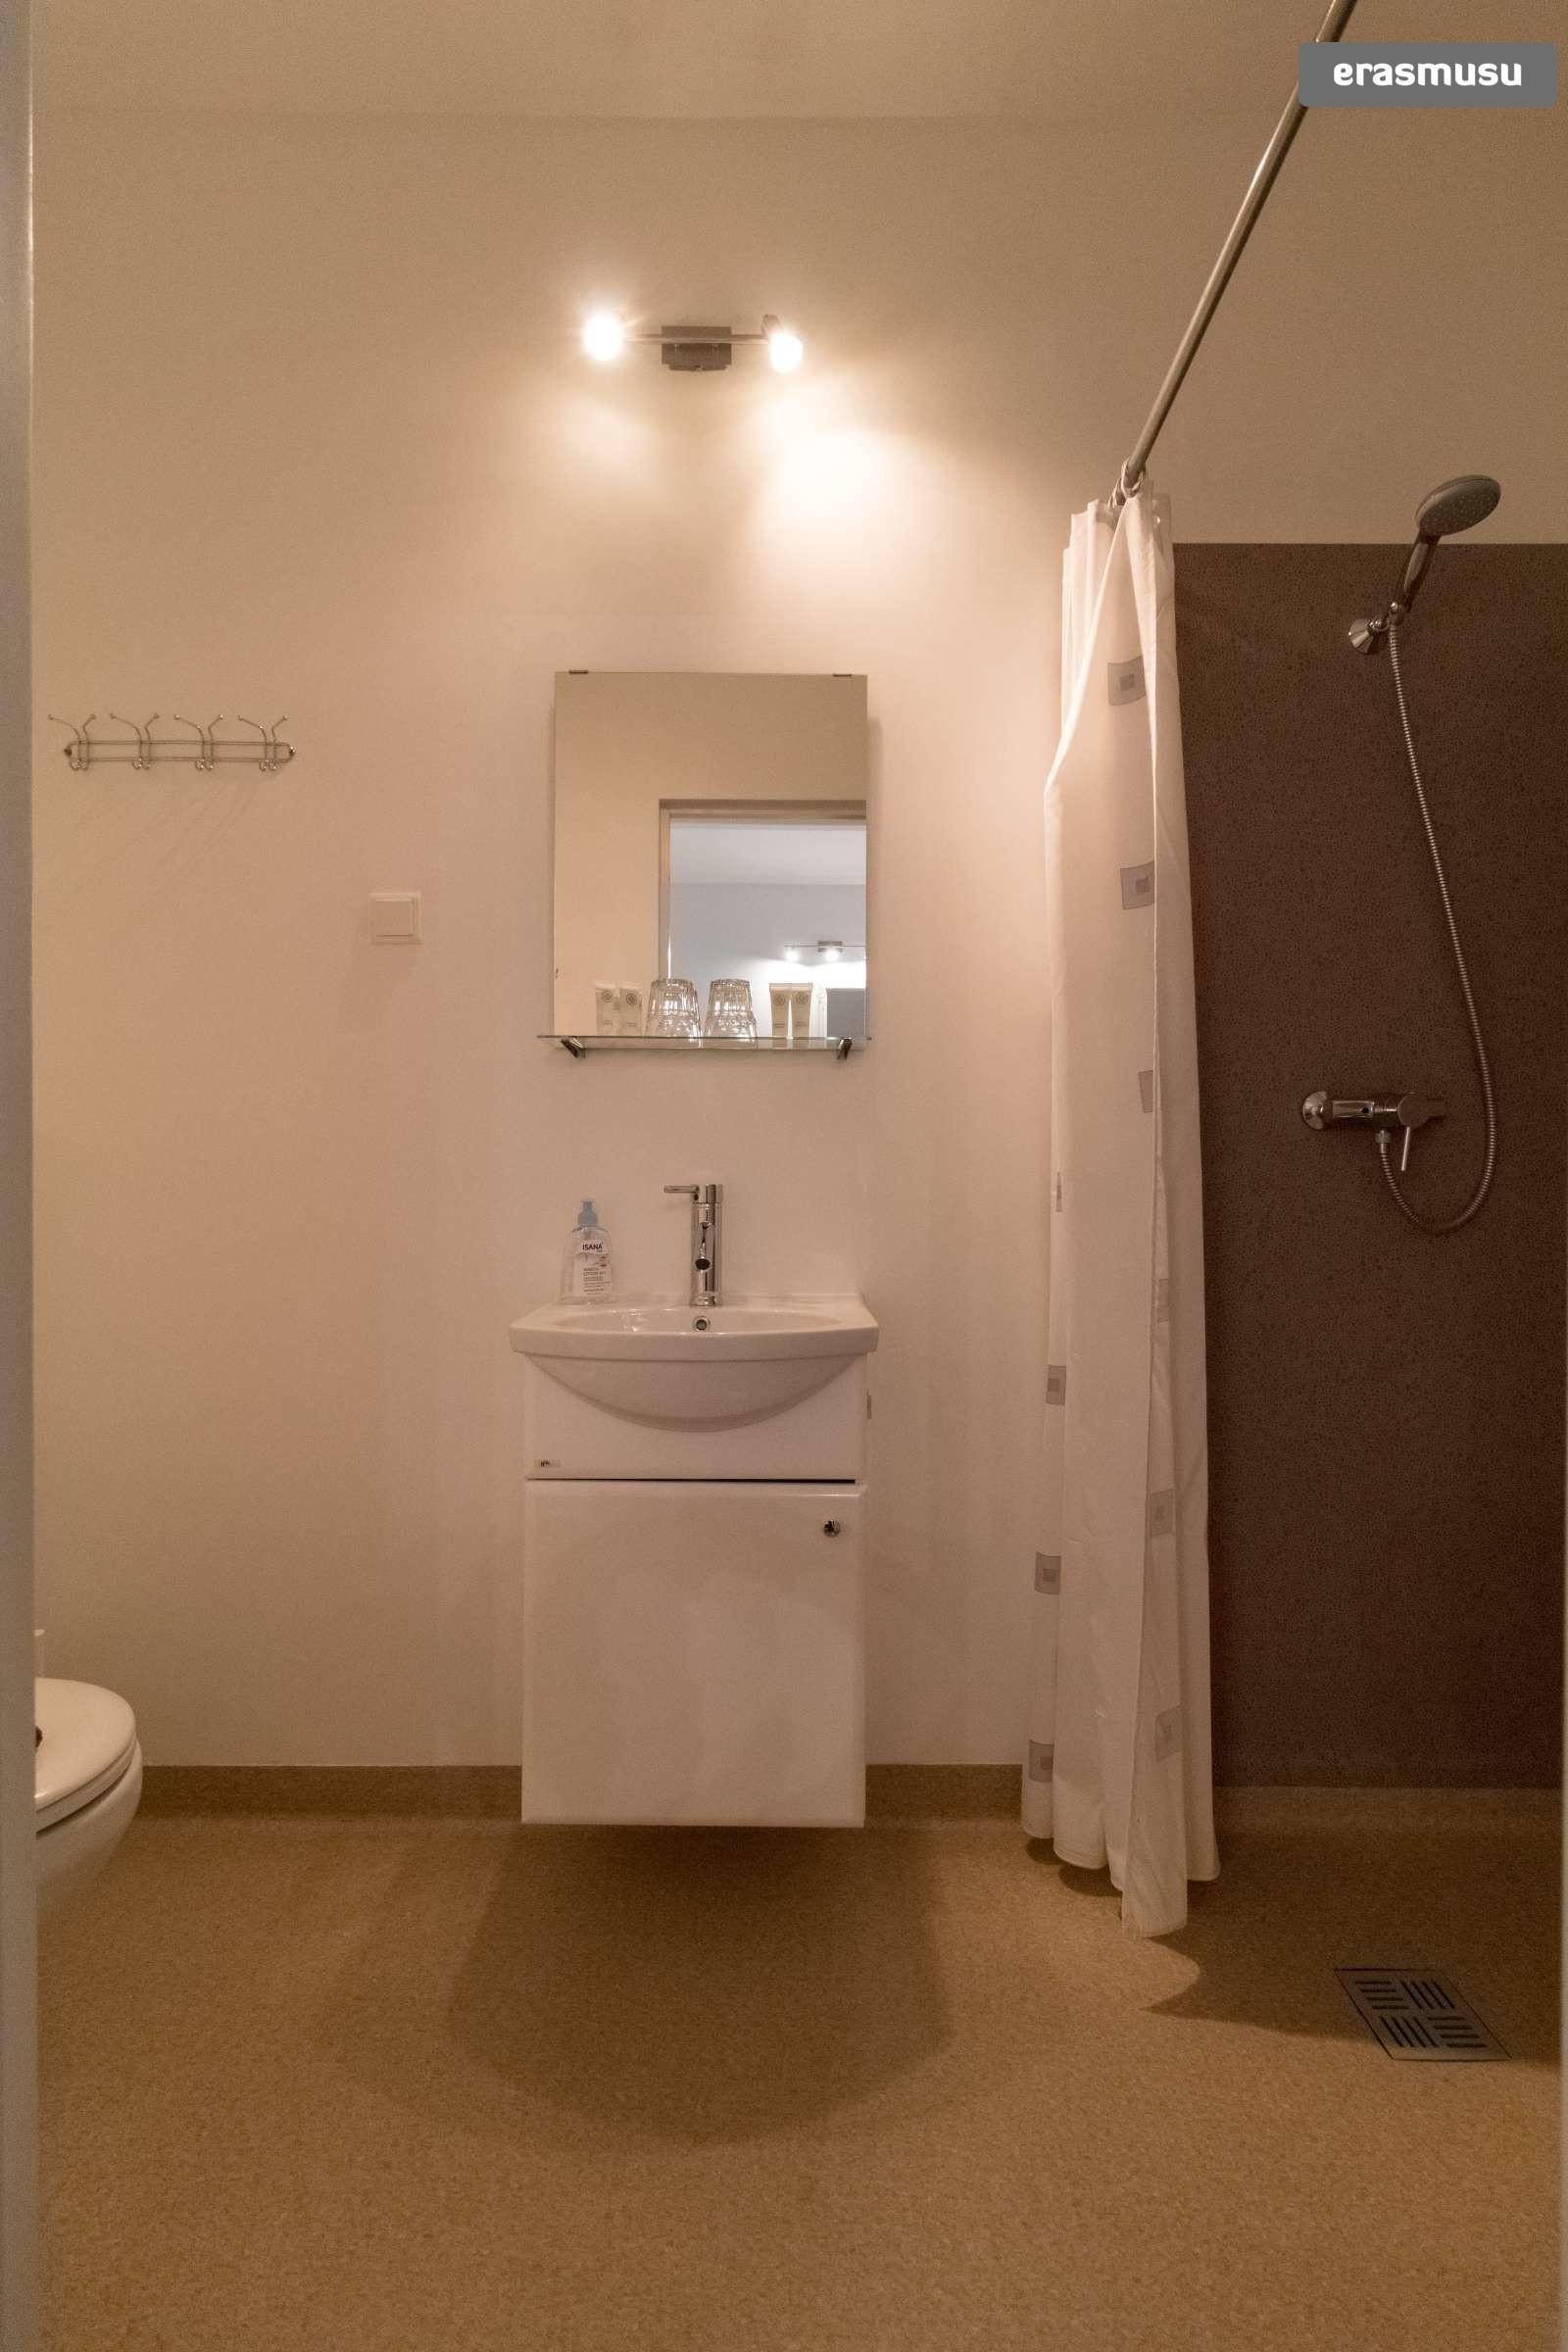 spacious-ensuite-room-kitchenette-rent-agenskalns-1dfe3a785e3b23